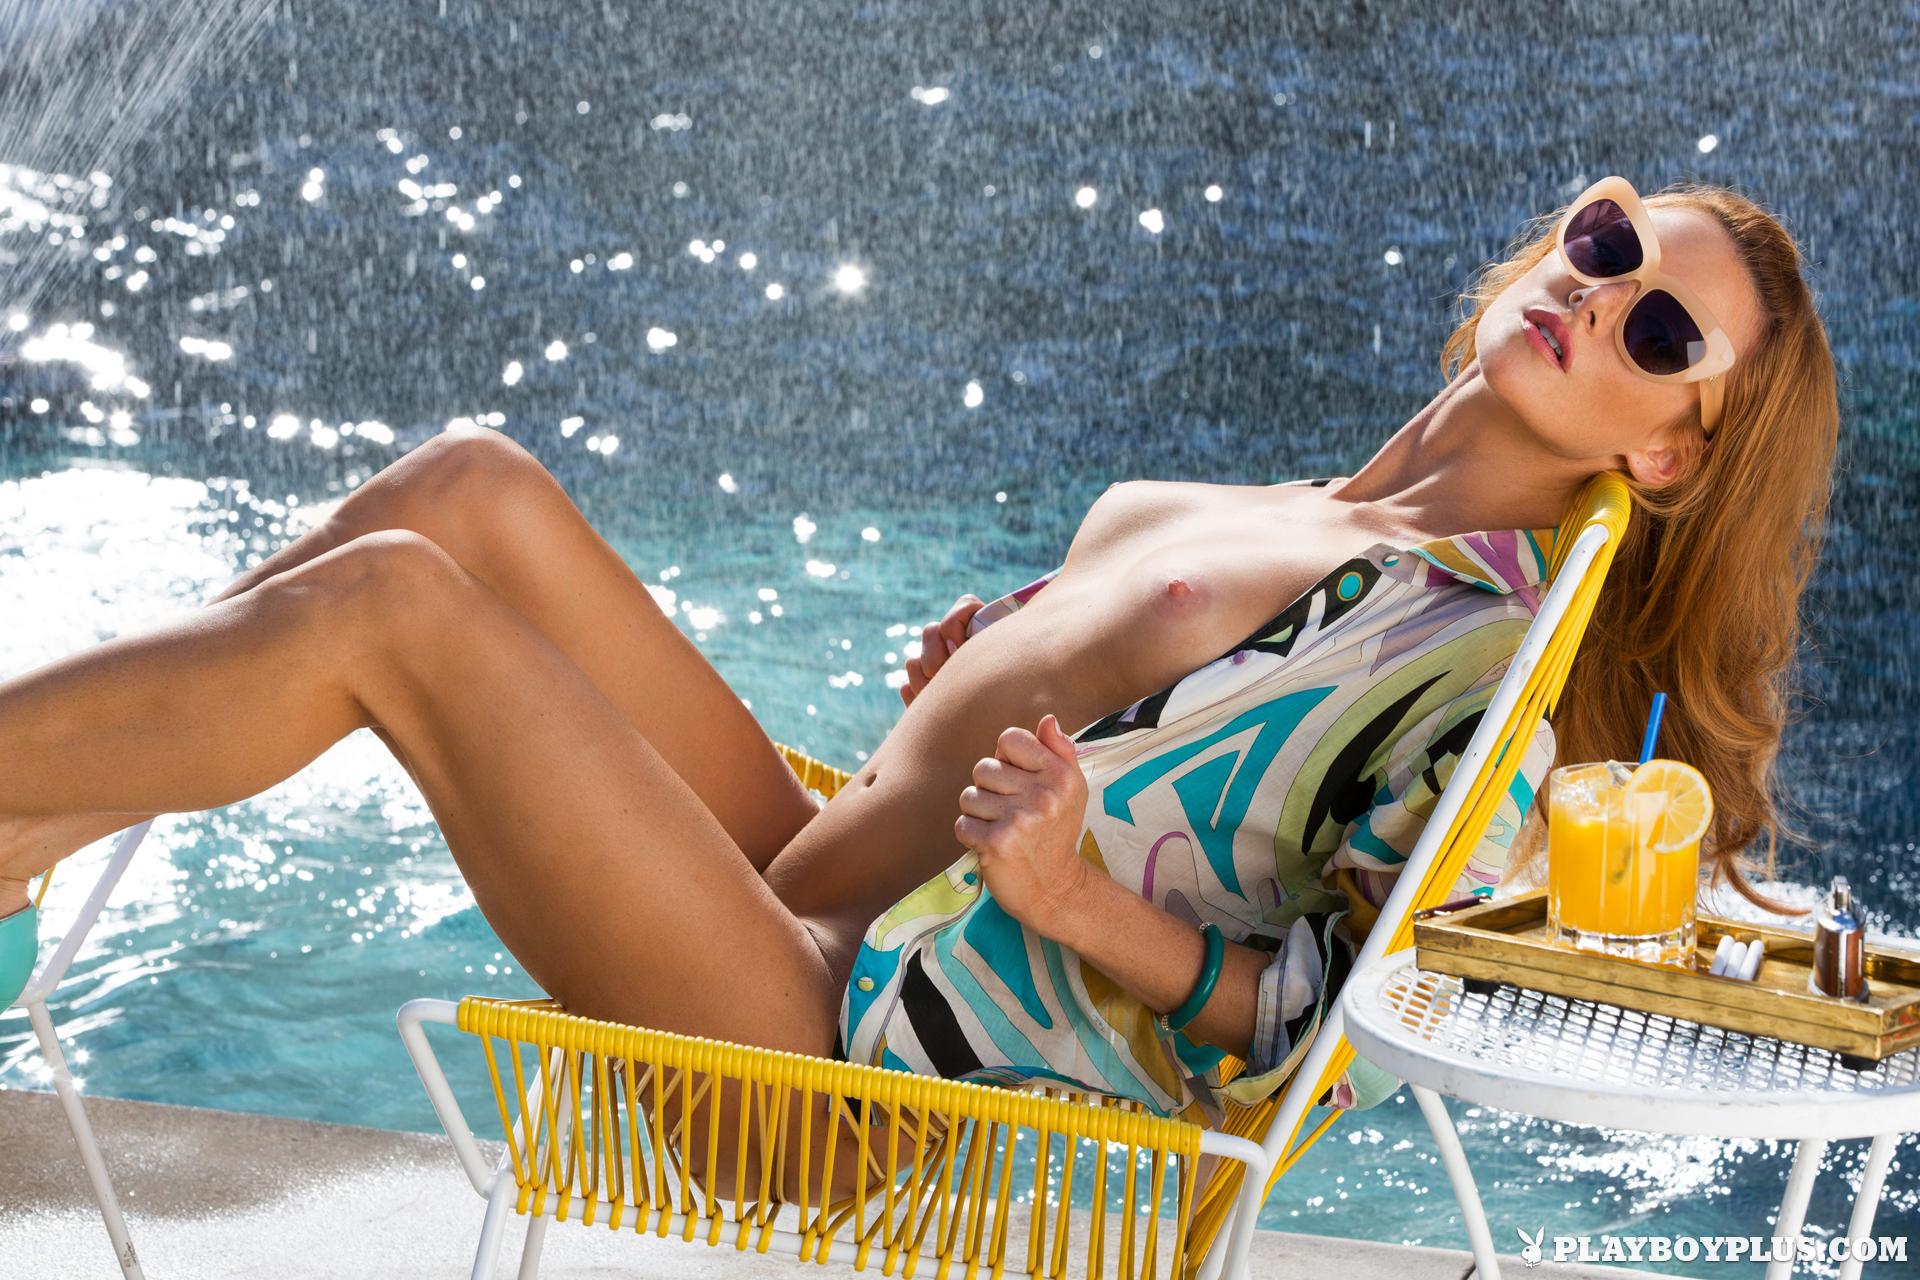 gia-marie-pool-wet-naked-sunglasses-playboy-05